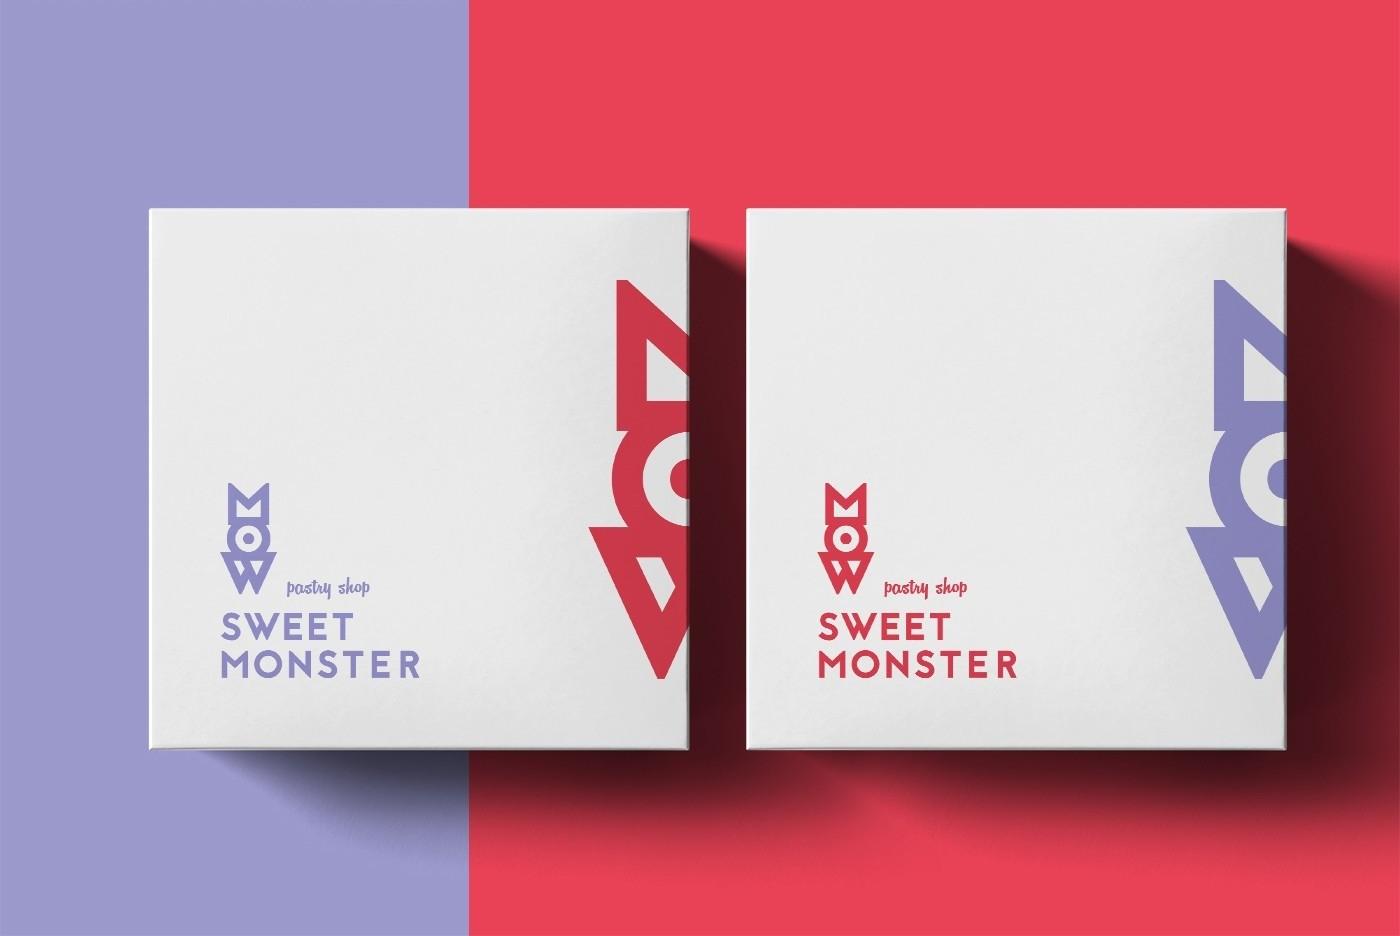 Spyros Partsinevelos – Sweet Monster | Pastry Shop (Concept)